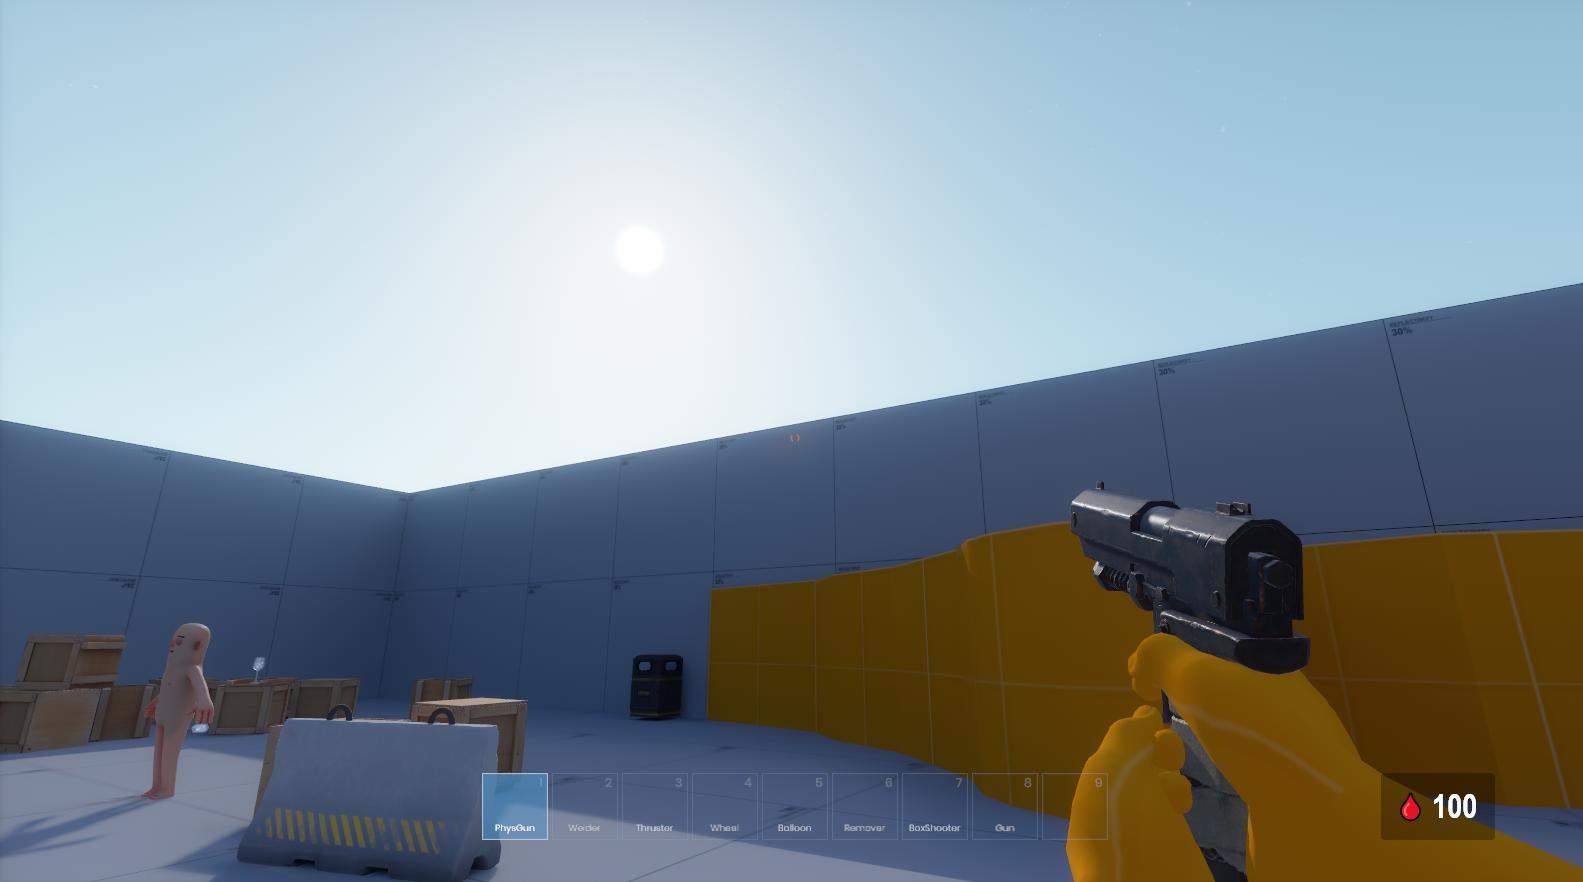 Garry's Mod successor Sandbox is looking lit in new development update